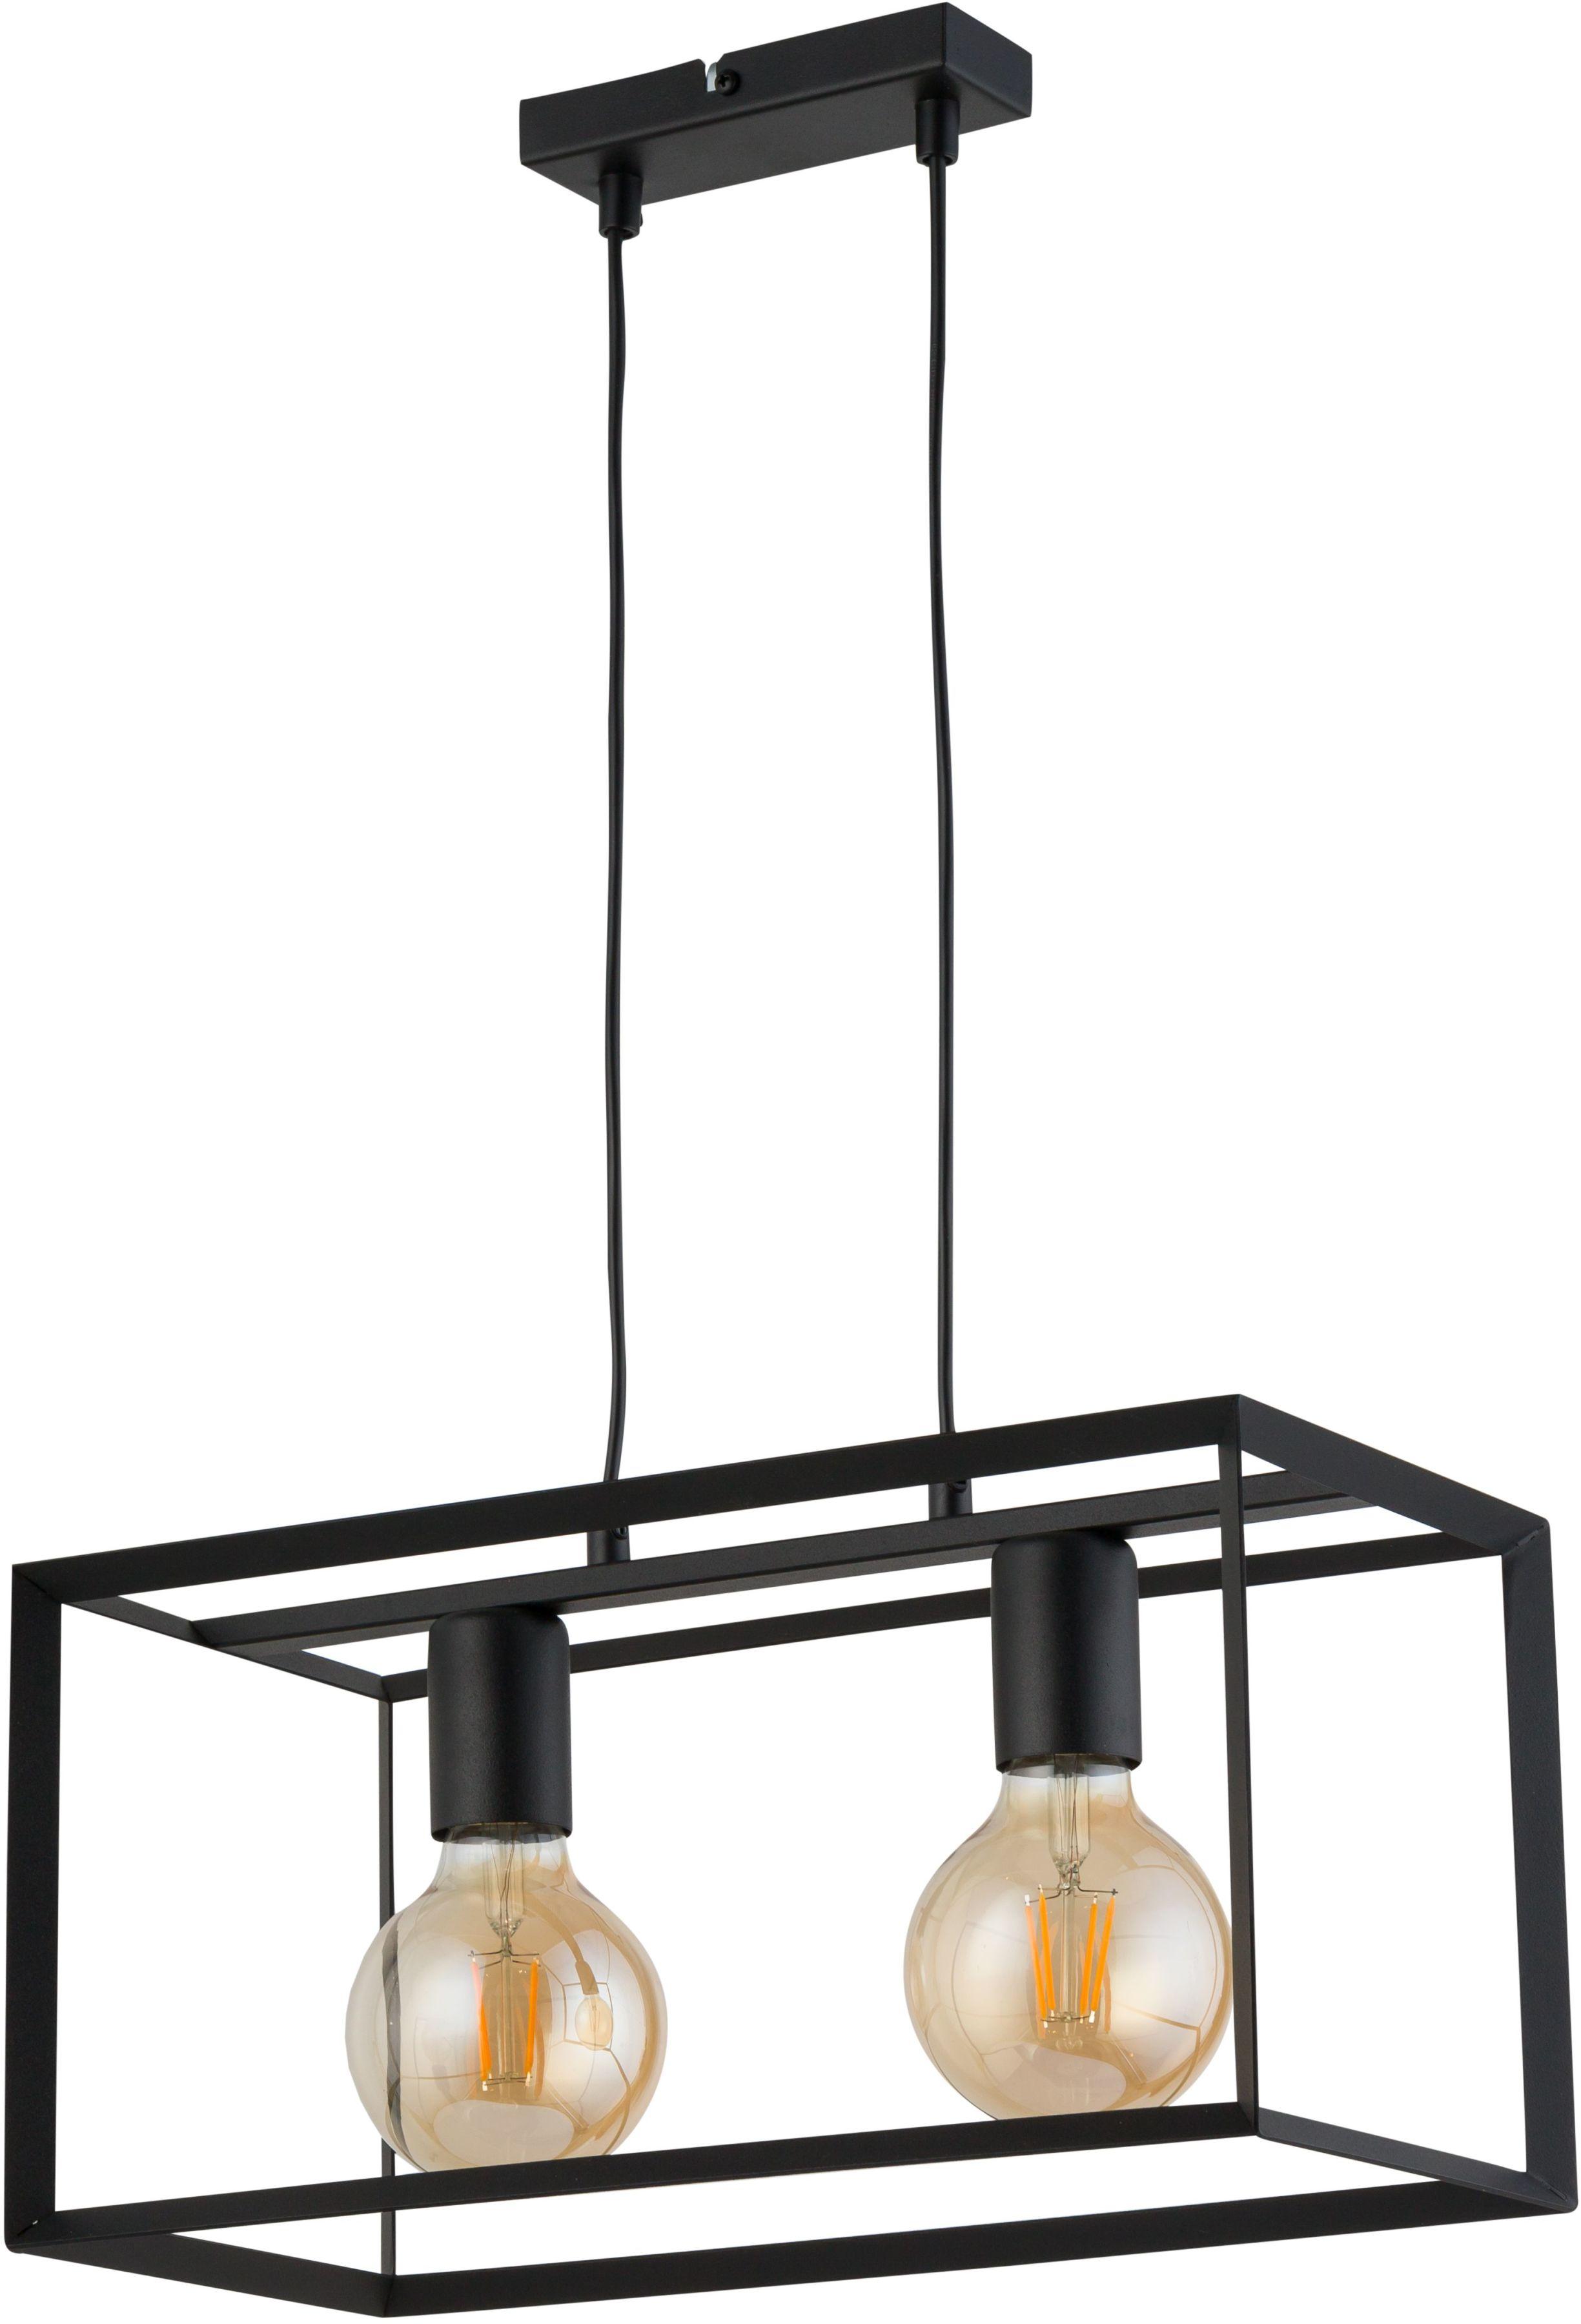 SIGMA LAMPA ZWIS CUBE 32050